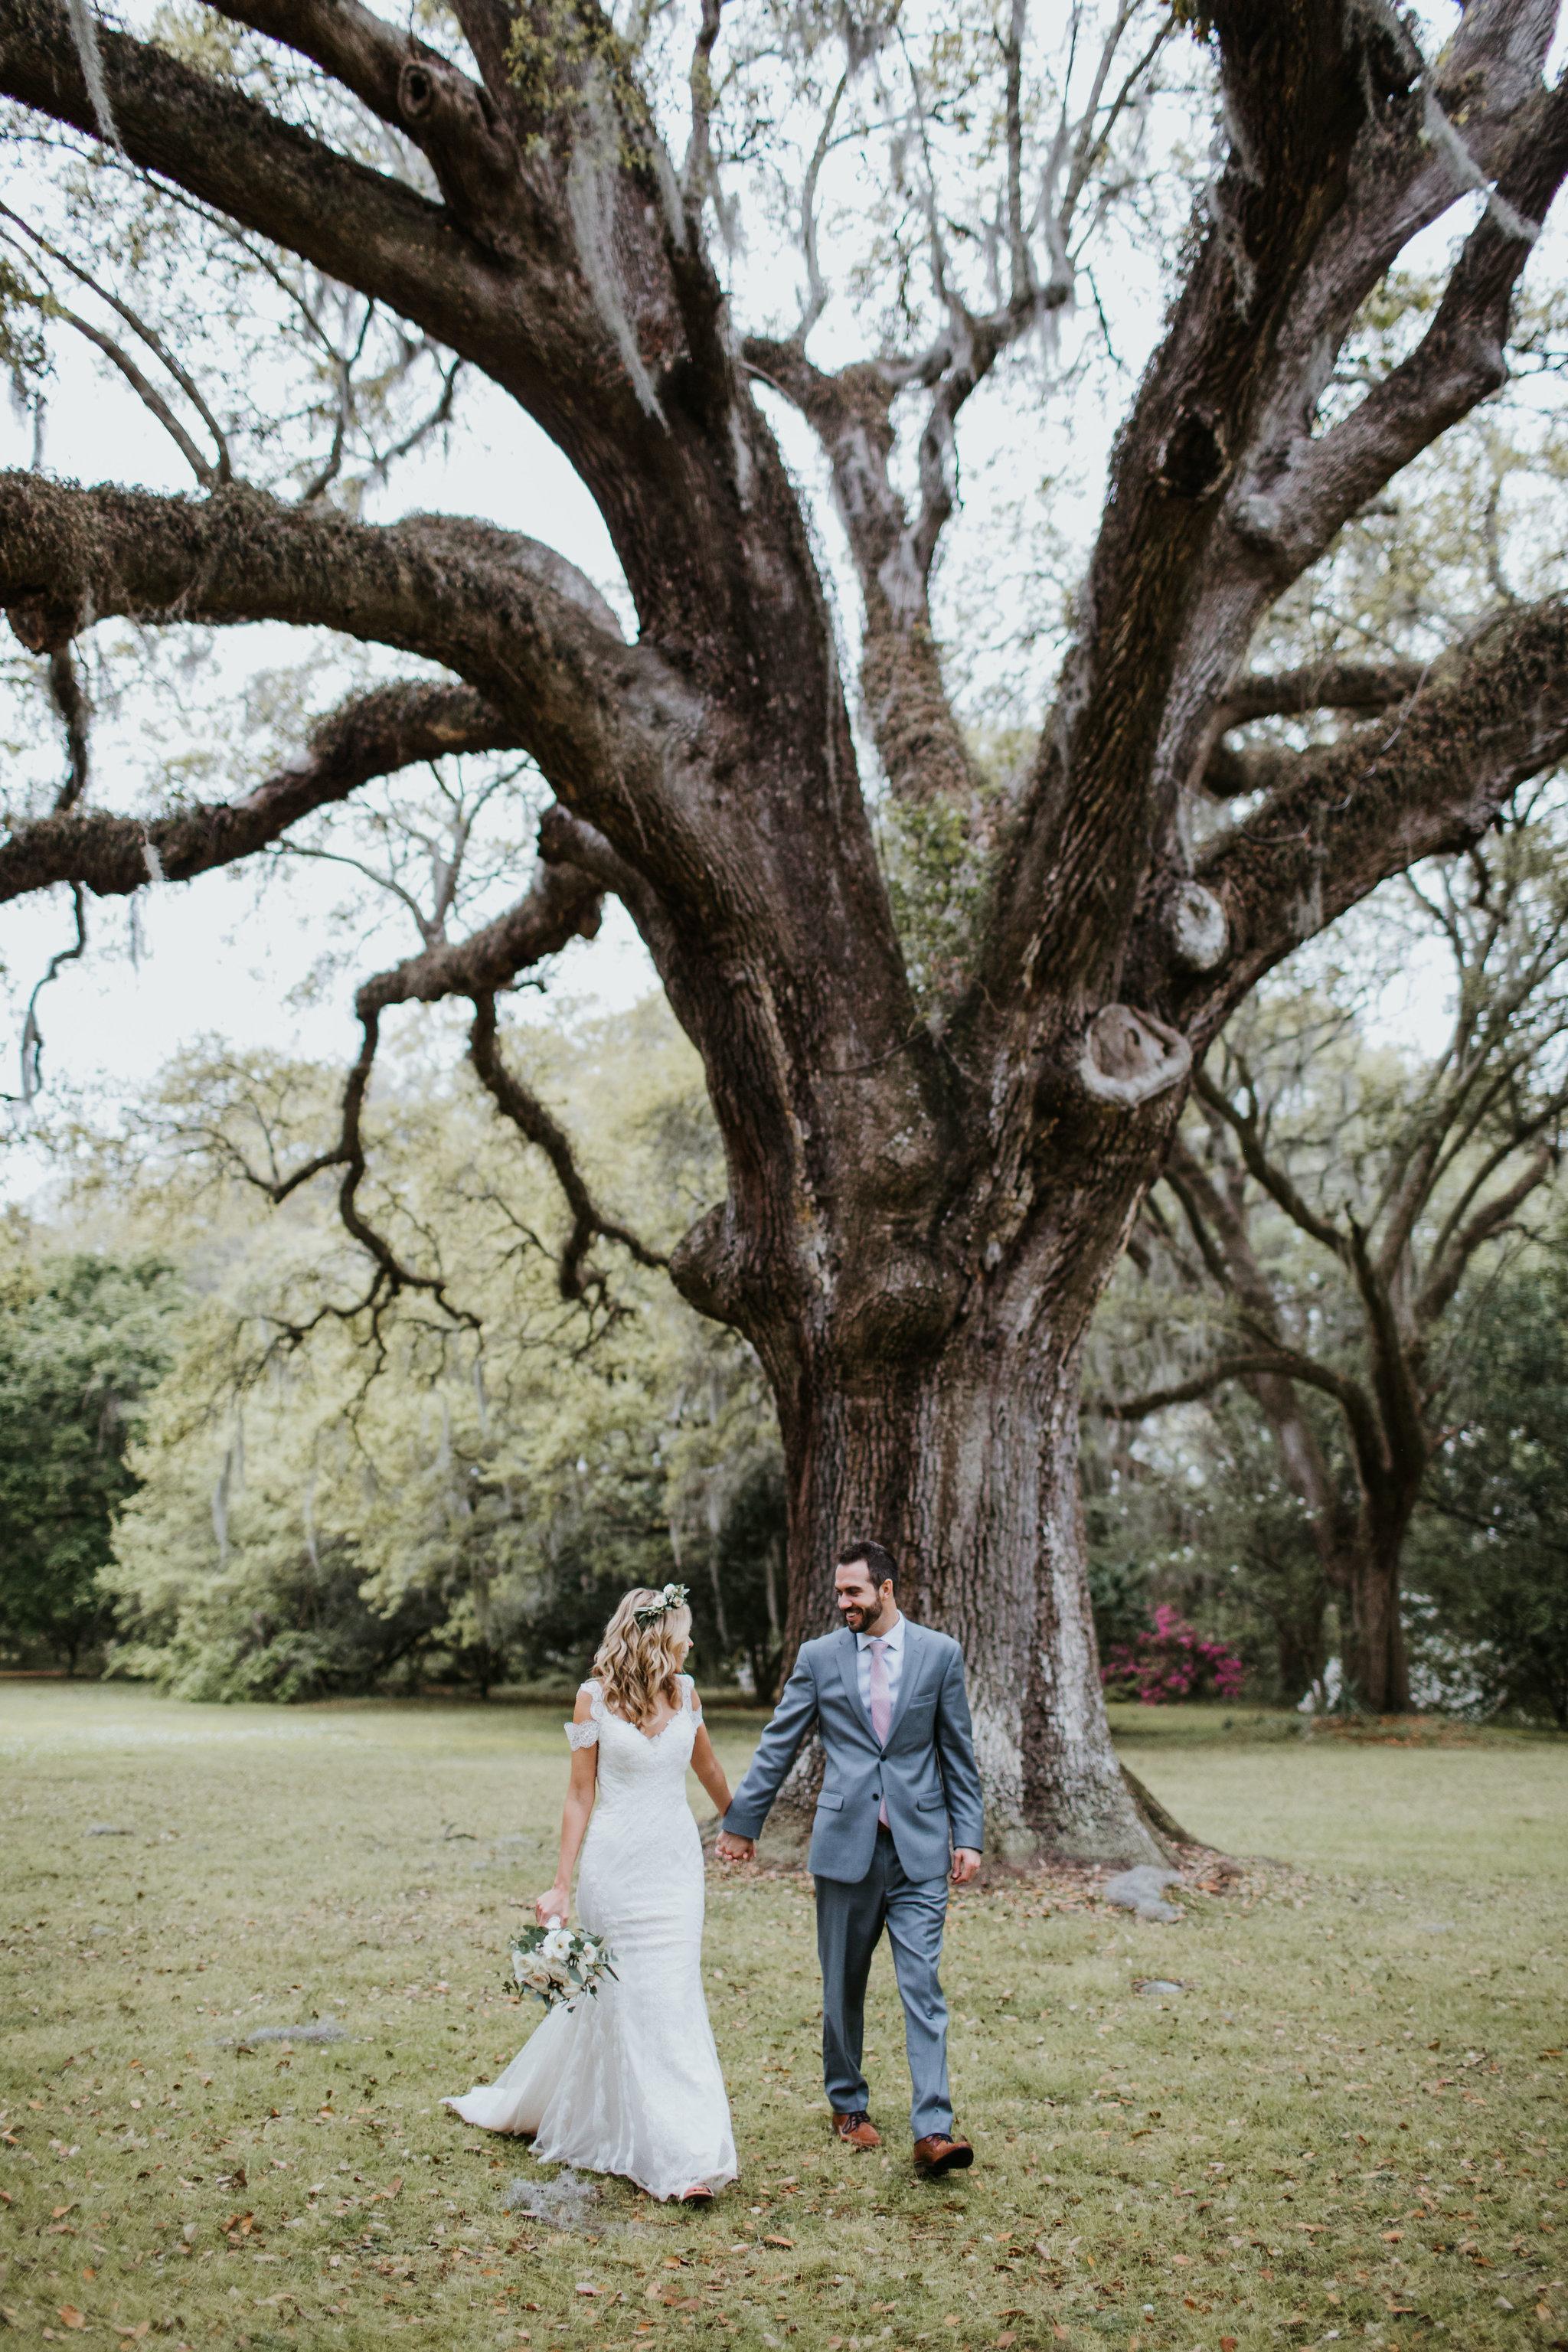 Legare-Waring-House-Charleston-SC-wedding-portrait-photography-303.jpg